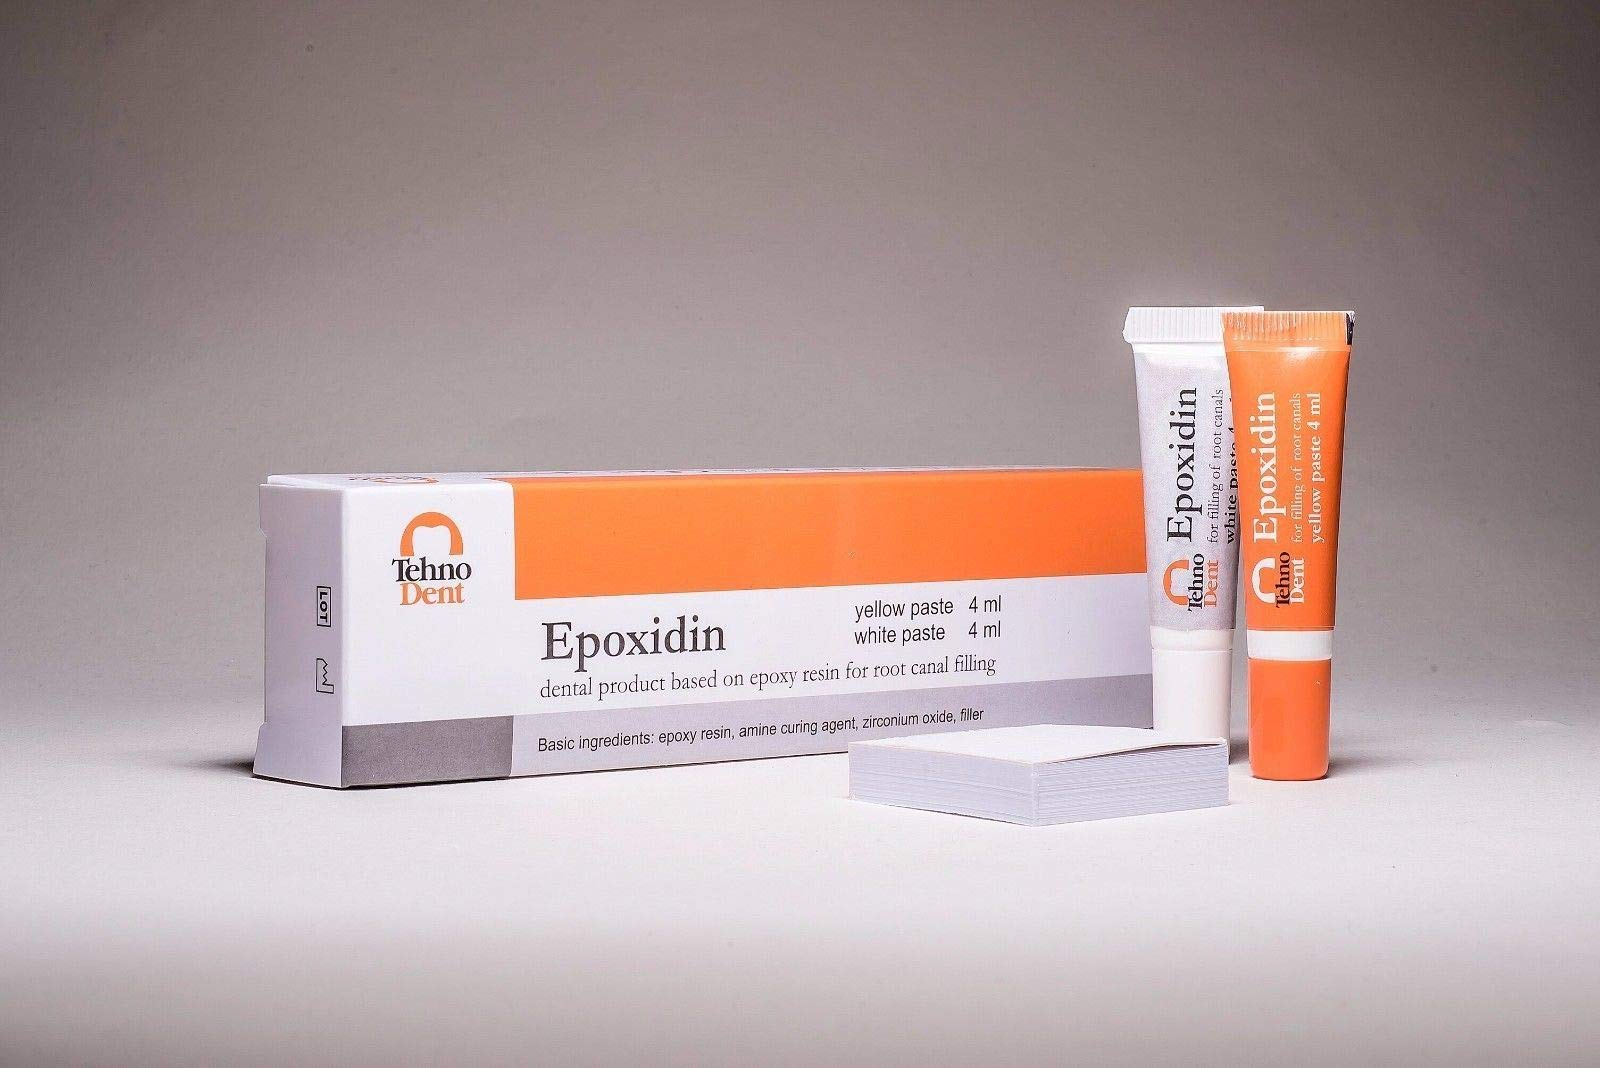 Epoxidin Dental Product Sealer Based on epoxy Amine Resin Same as AH Plus